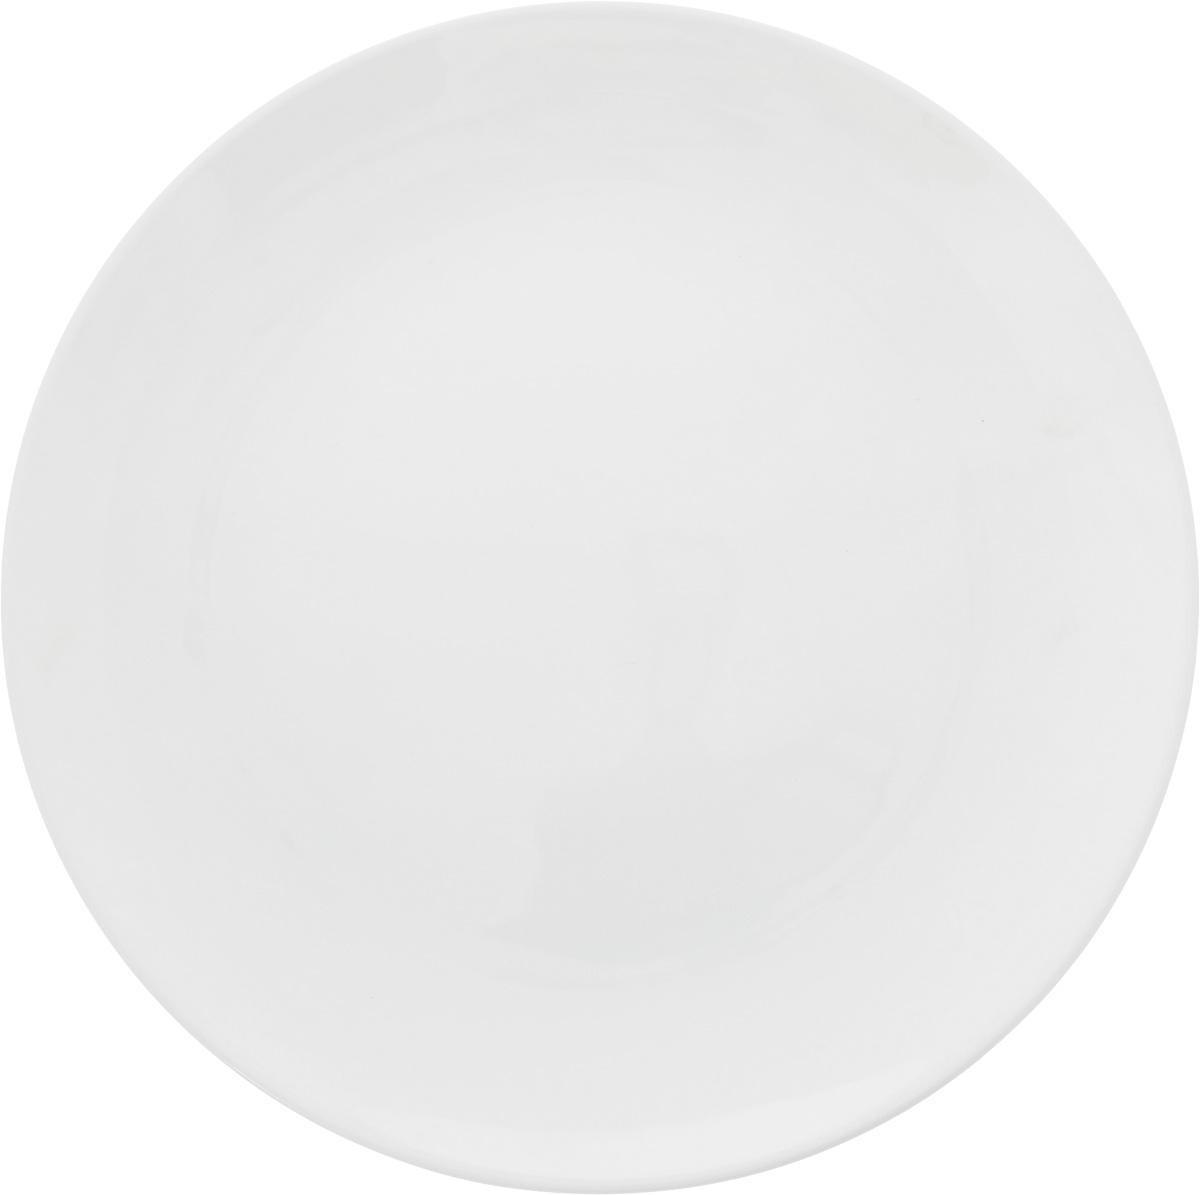 Тарелка Ariane Коуп, диаметр 24 см. AVCARN11024